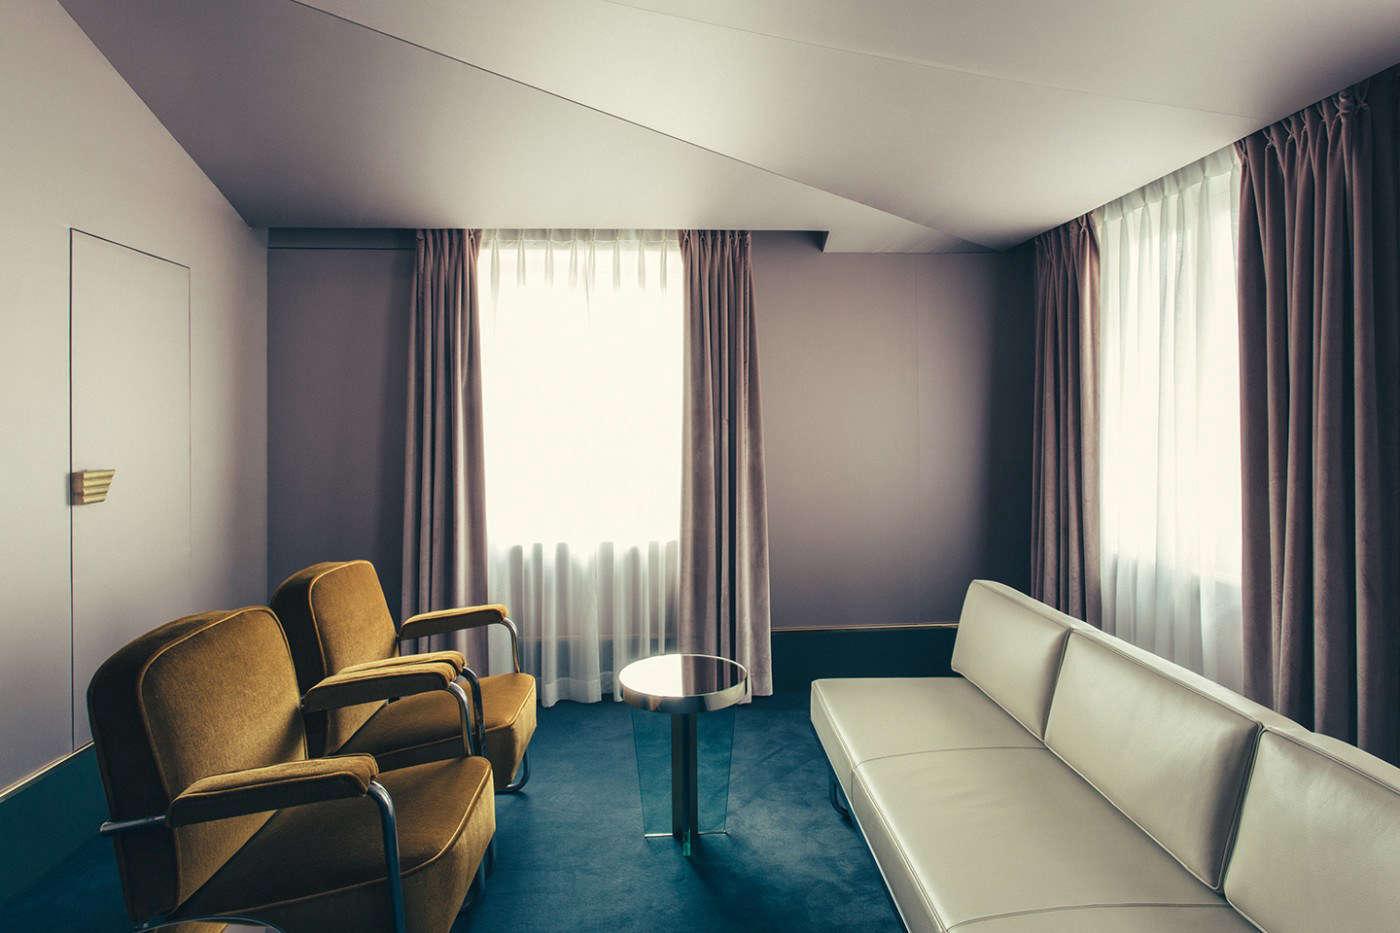 The New Hotel Saint Marc in Paris Designed by Dimore Studio